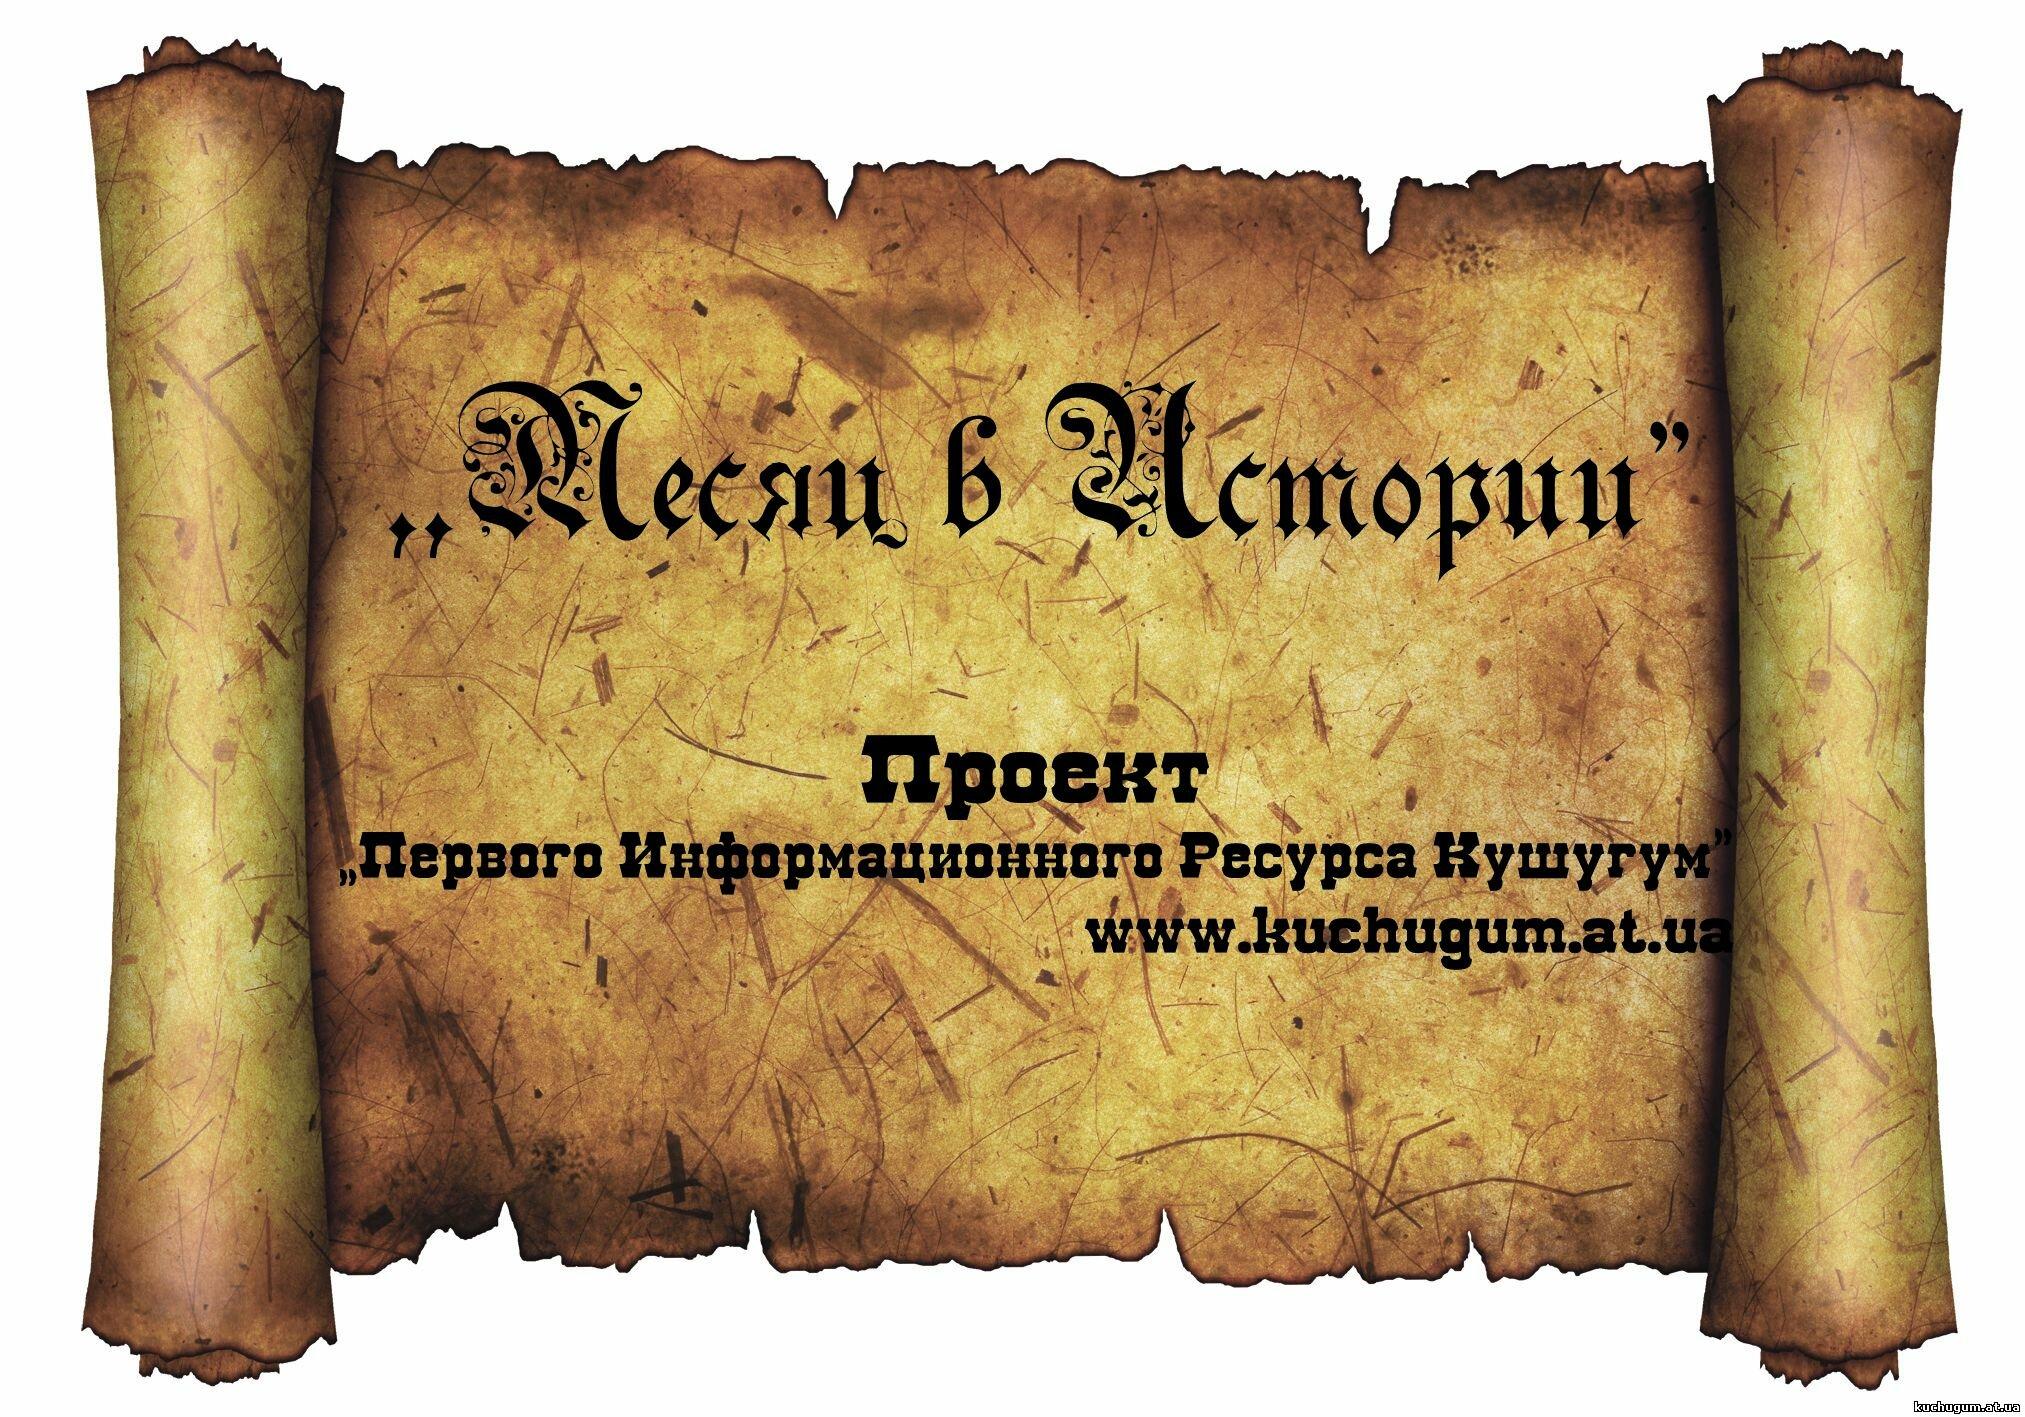 Месяц в истори - проект ресурса ПИР Кушугум